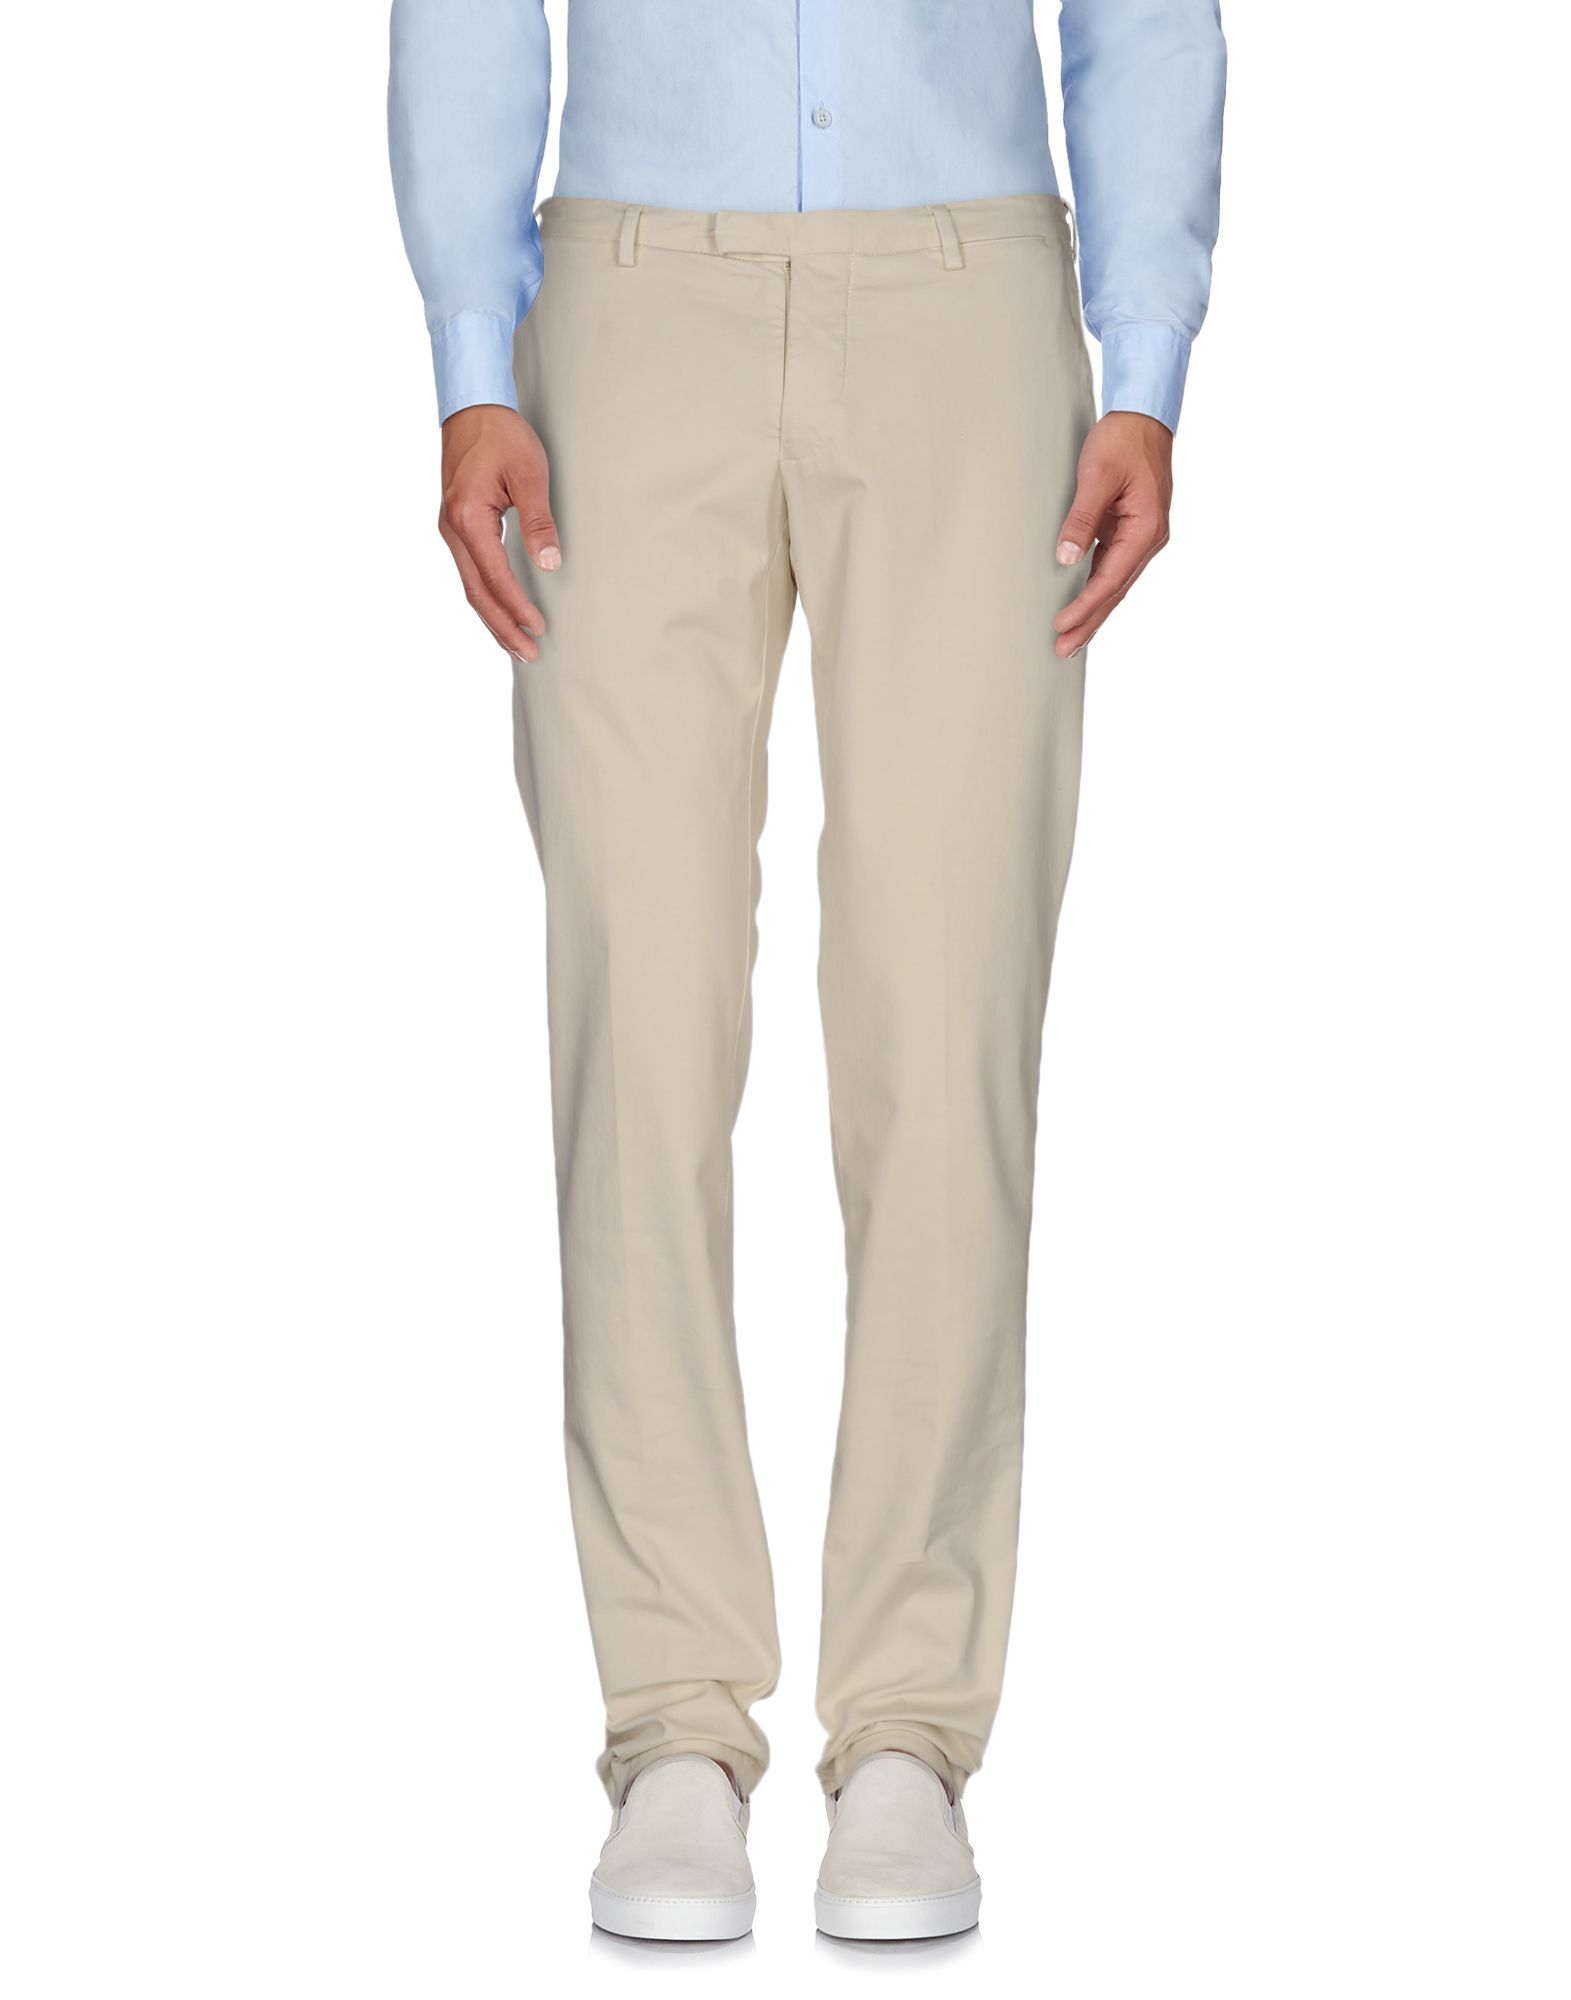 DANPOL Torino Повседневные брюки брюки pantaloni torino синий